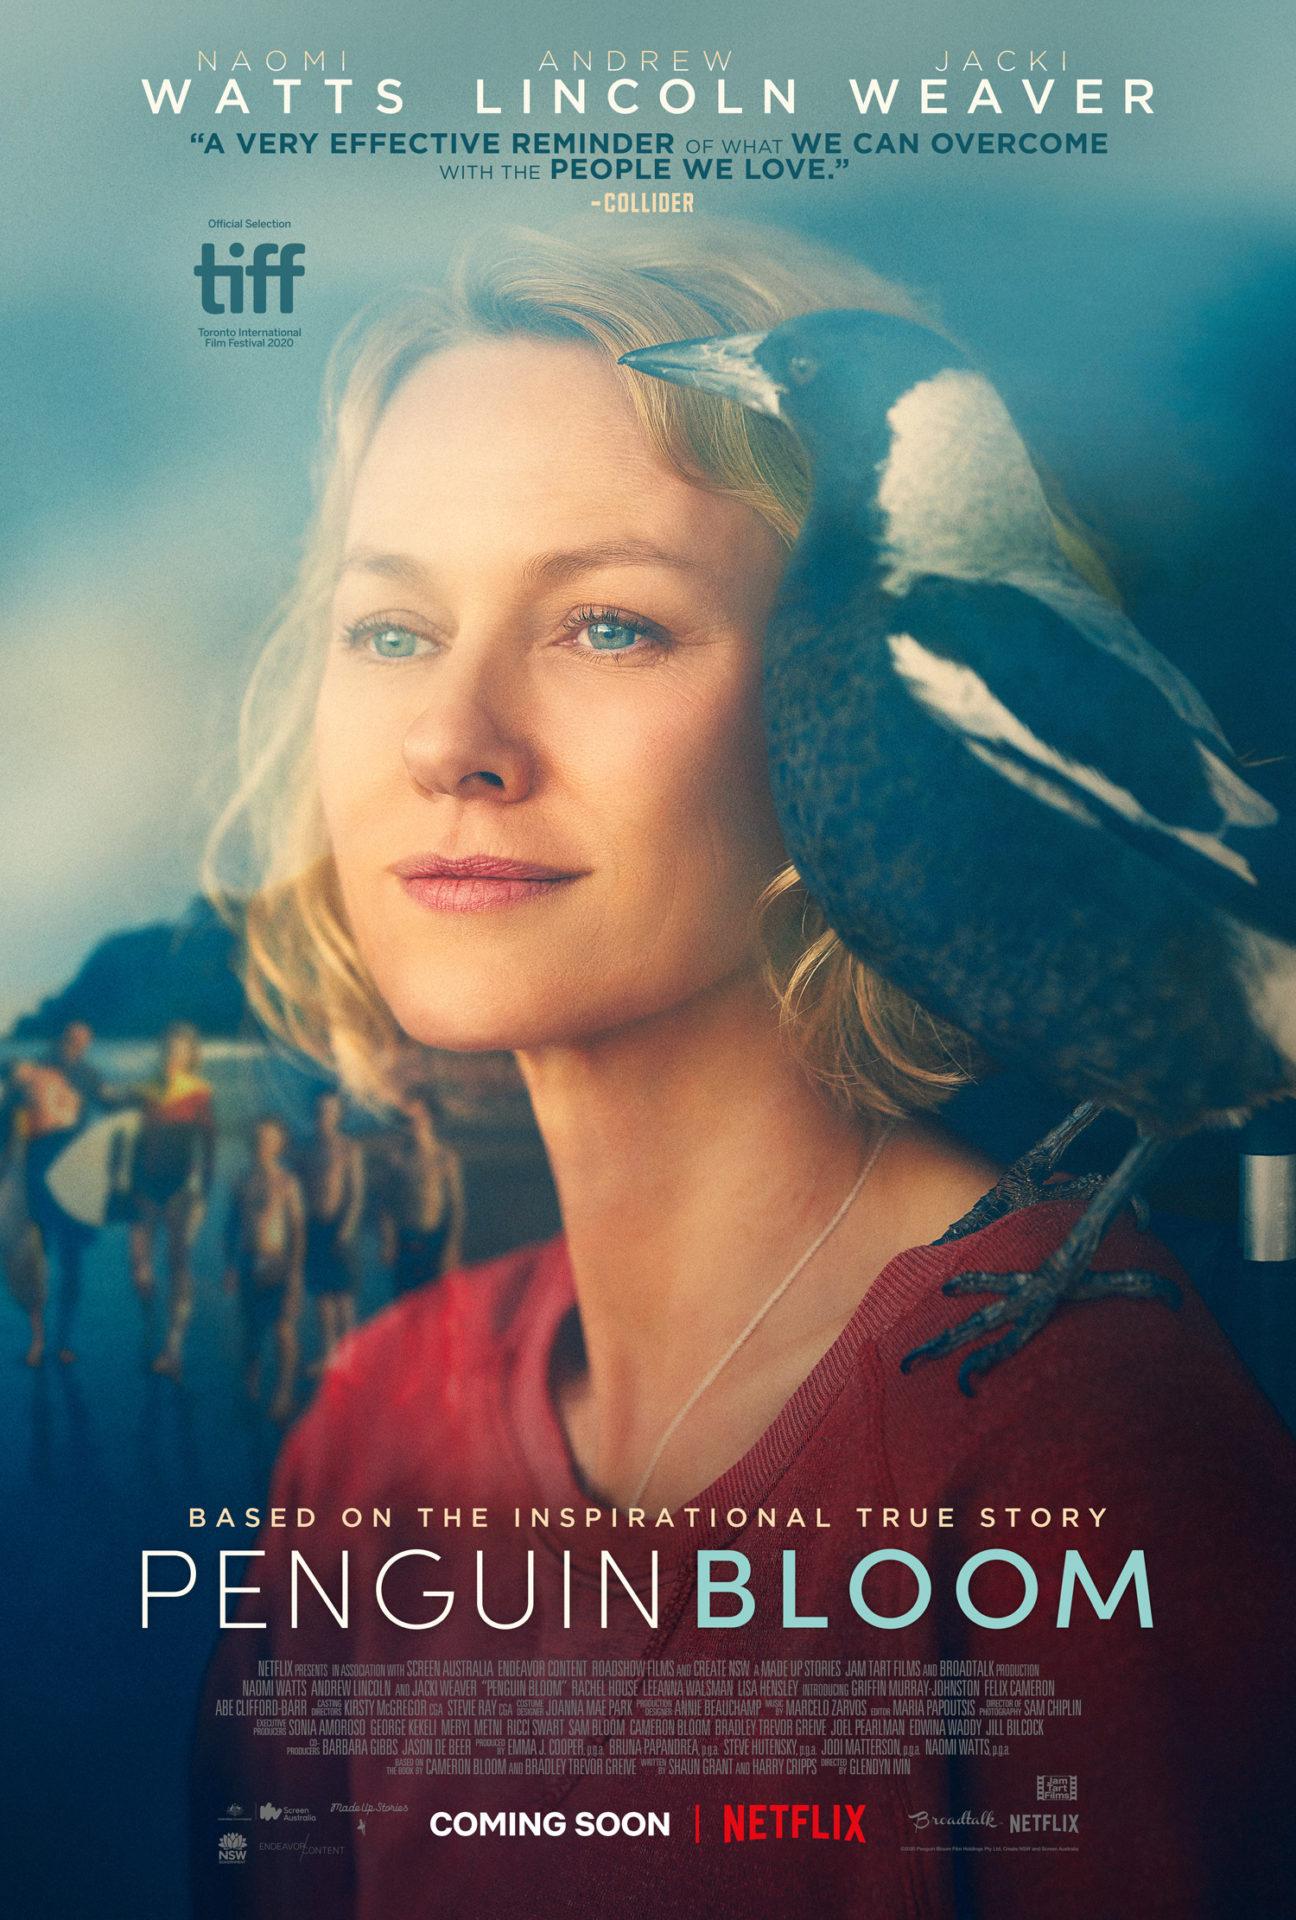 Netflix's Penguin Bloom Official Trailer